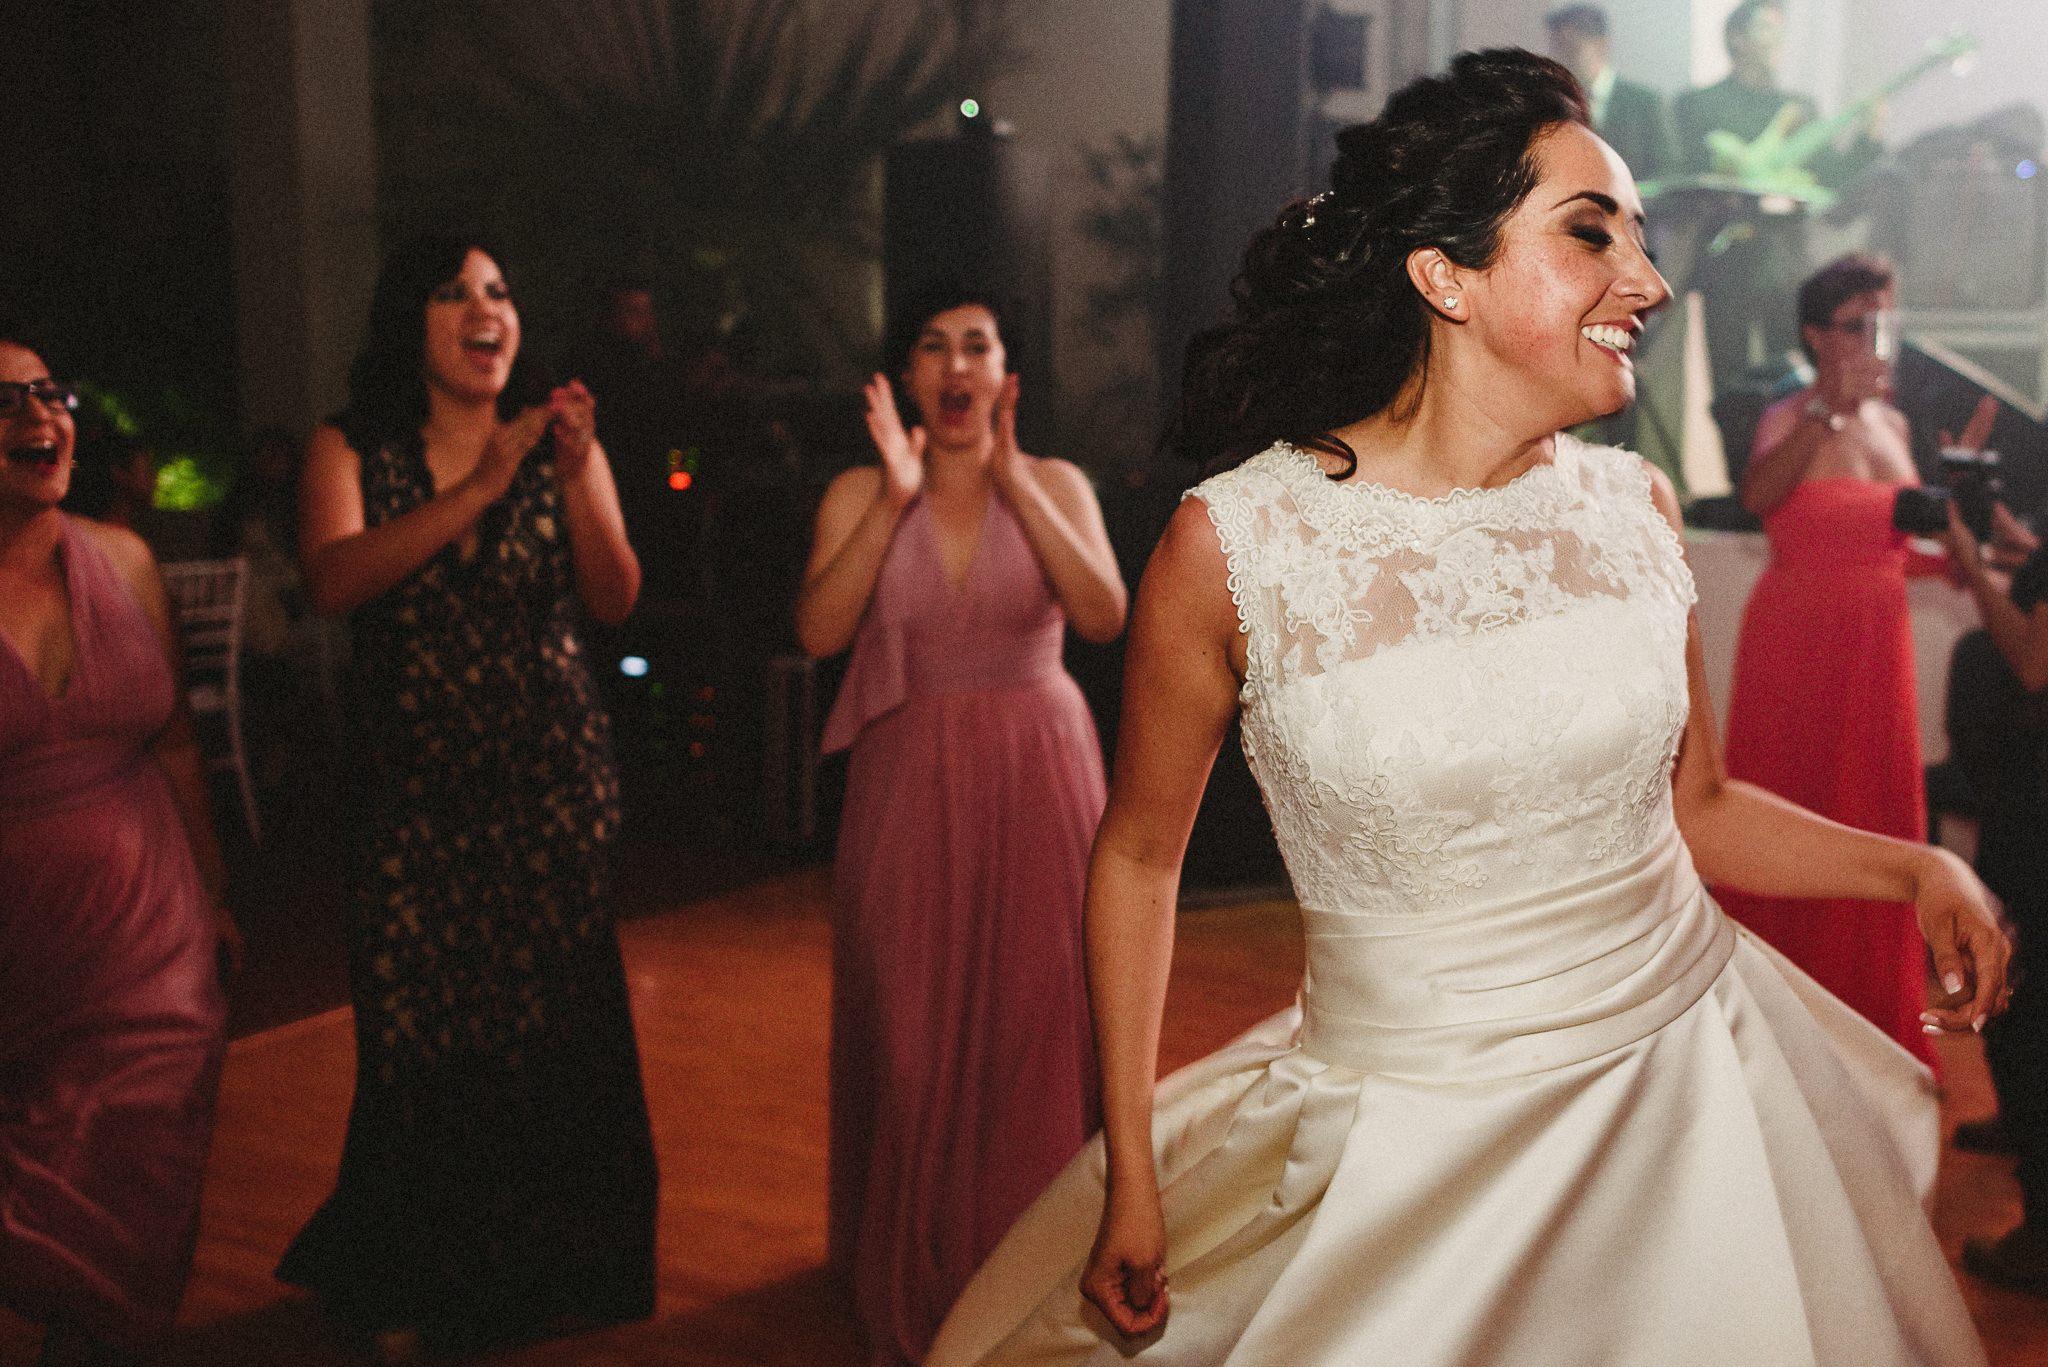 Wedding-Boda-Tulancingo-Hidalgo-Salon-Essenzia-Luis-Houdin-86-film